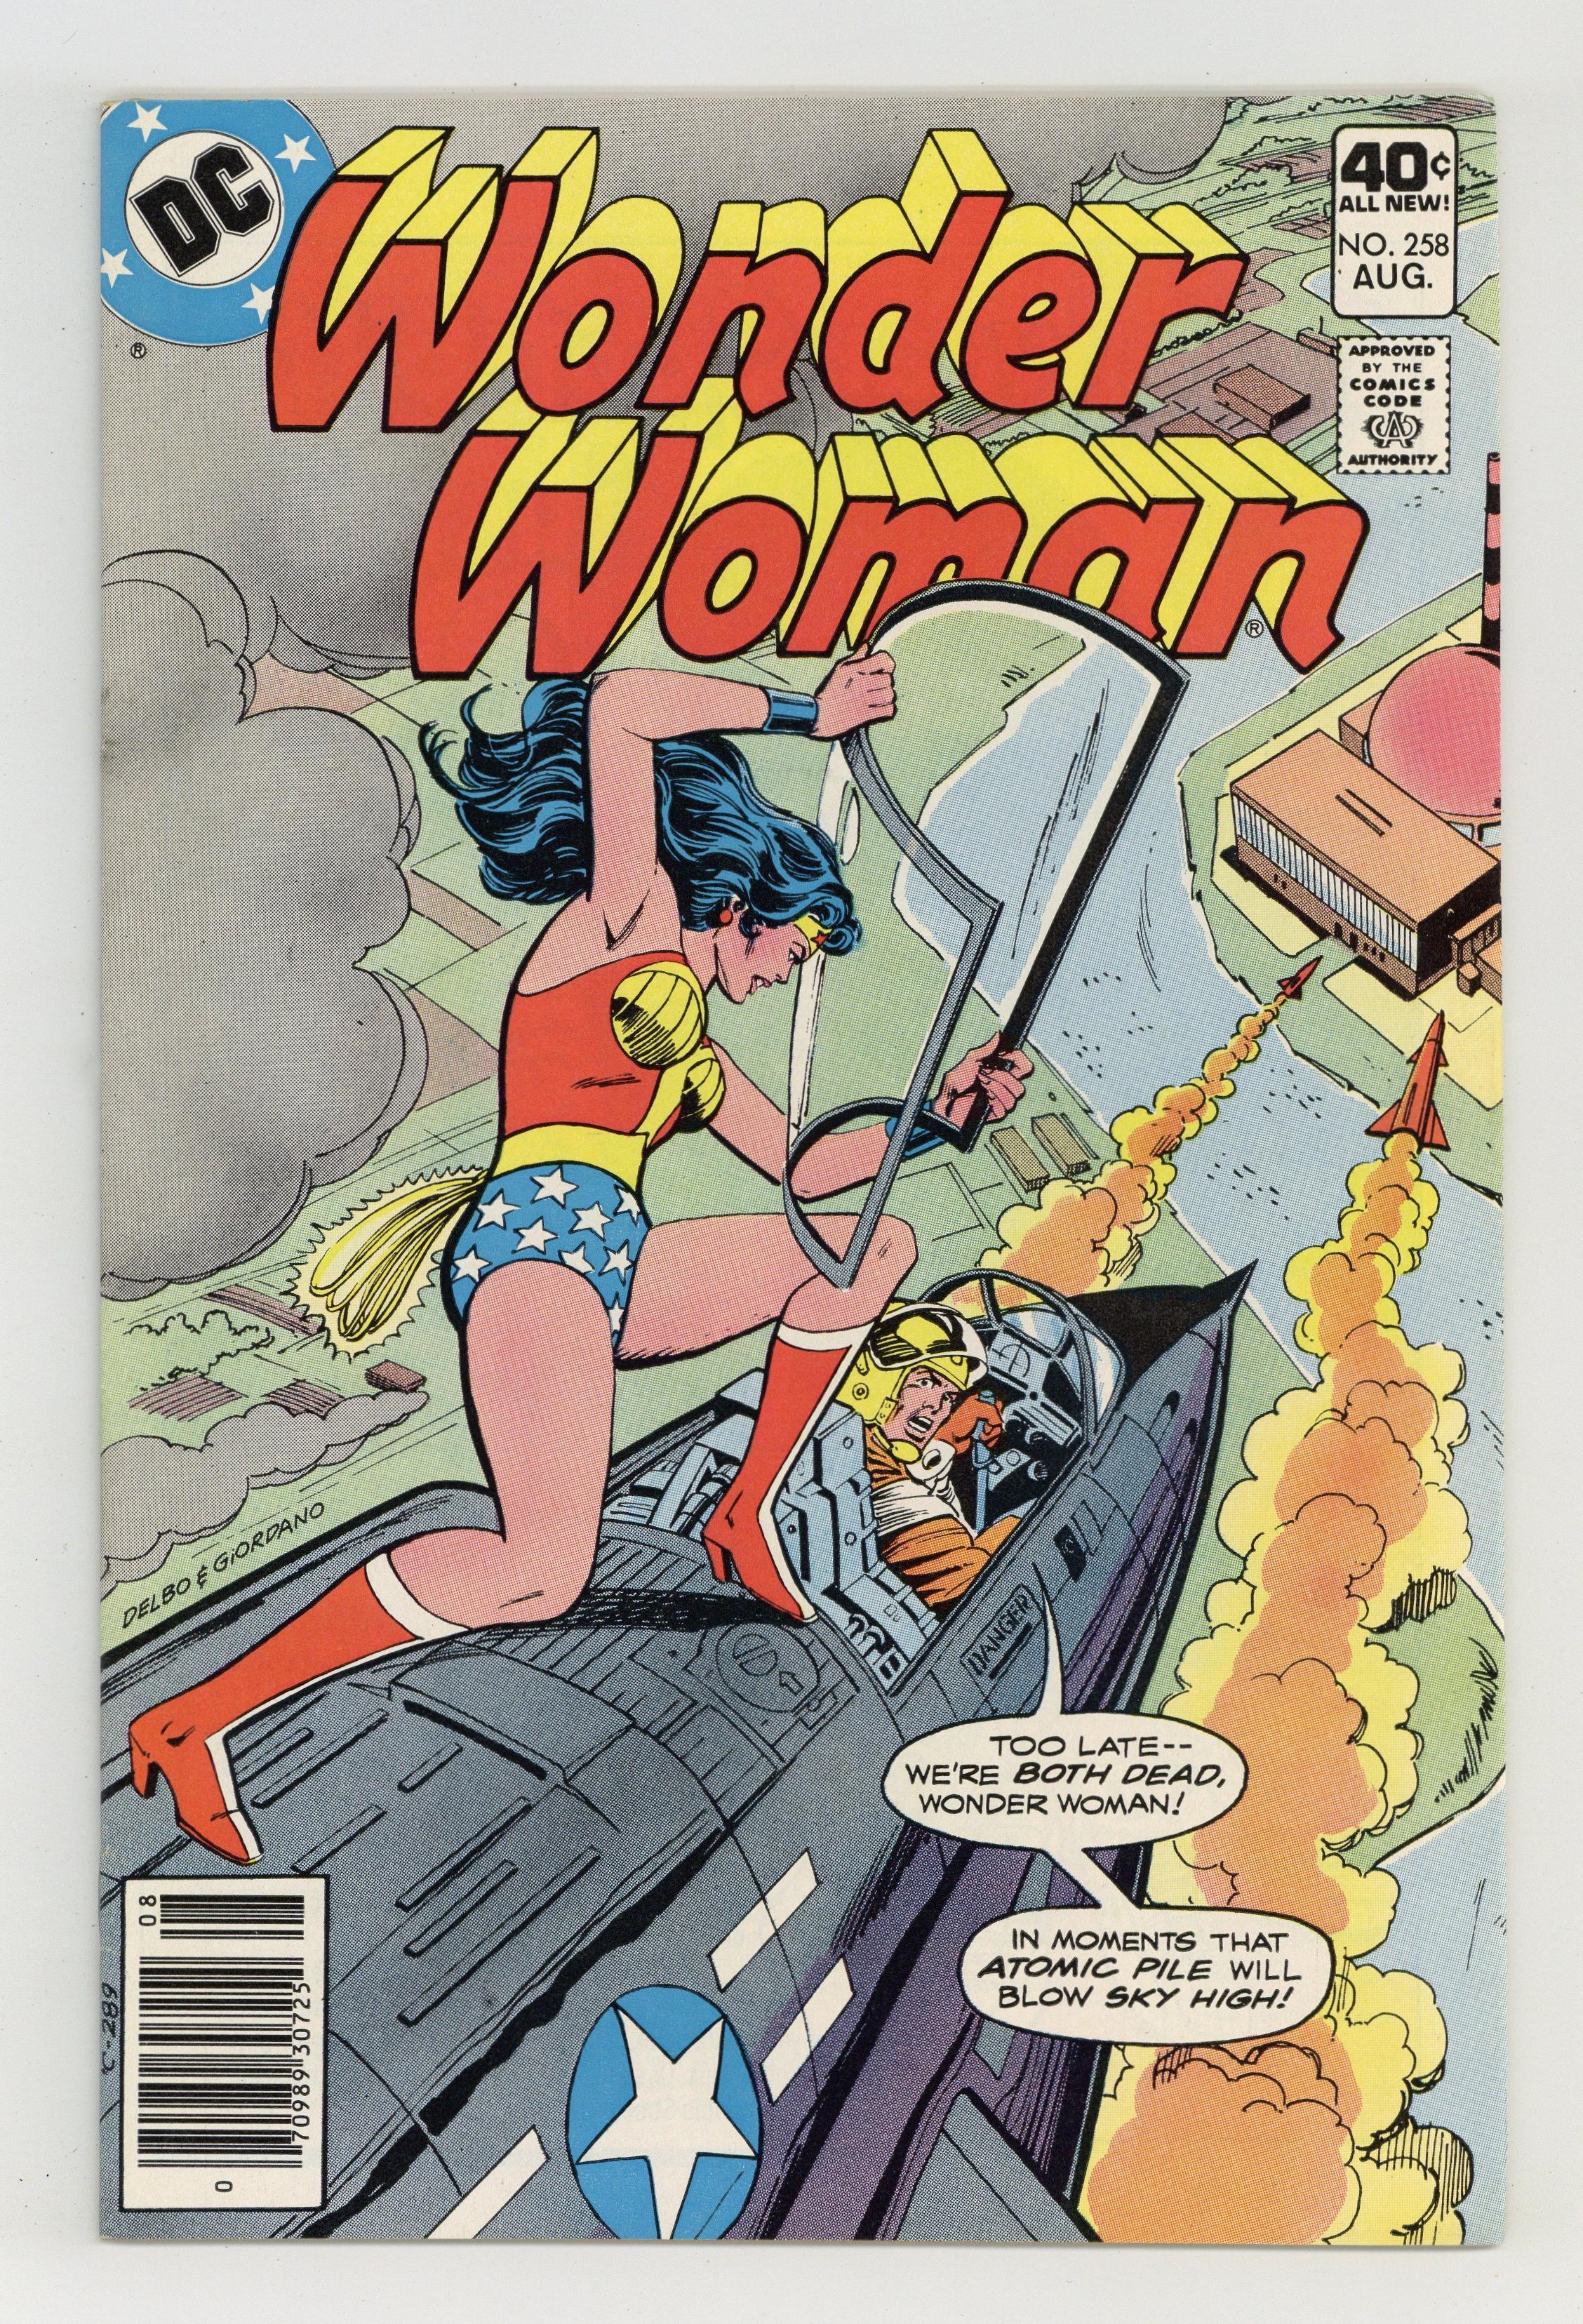 Just Imagine Wonder Woman #1 8.0 VF 2001